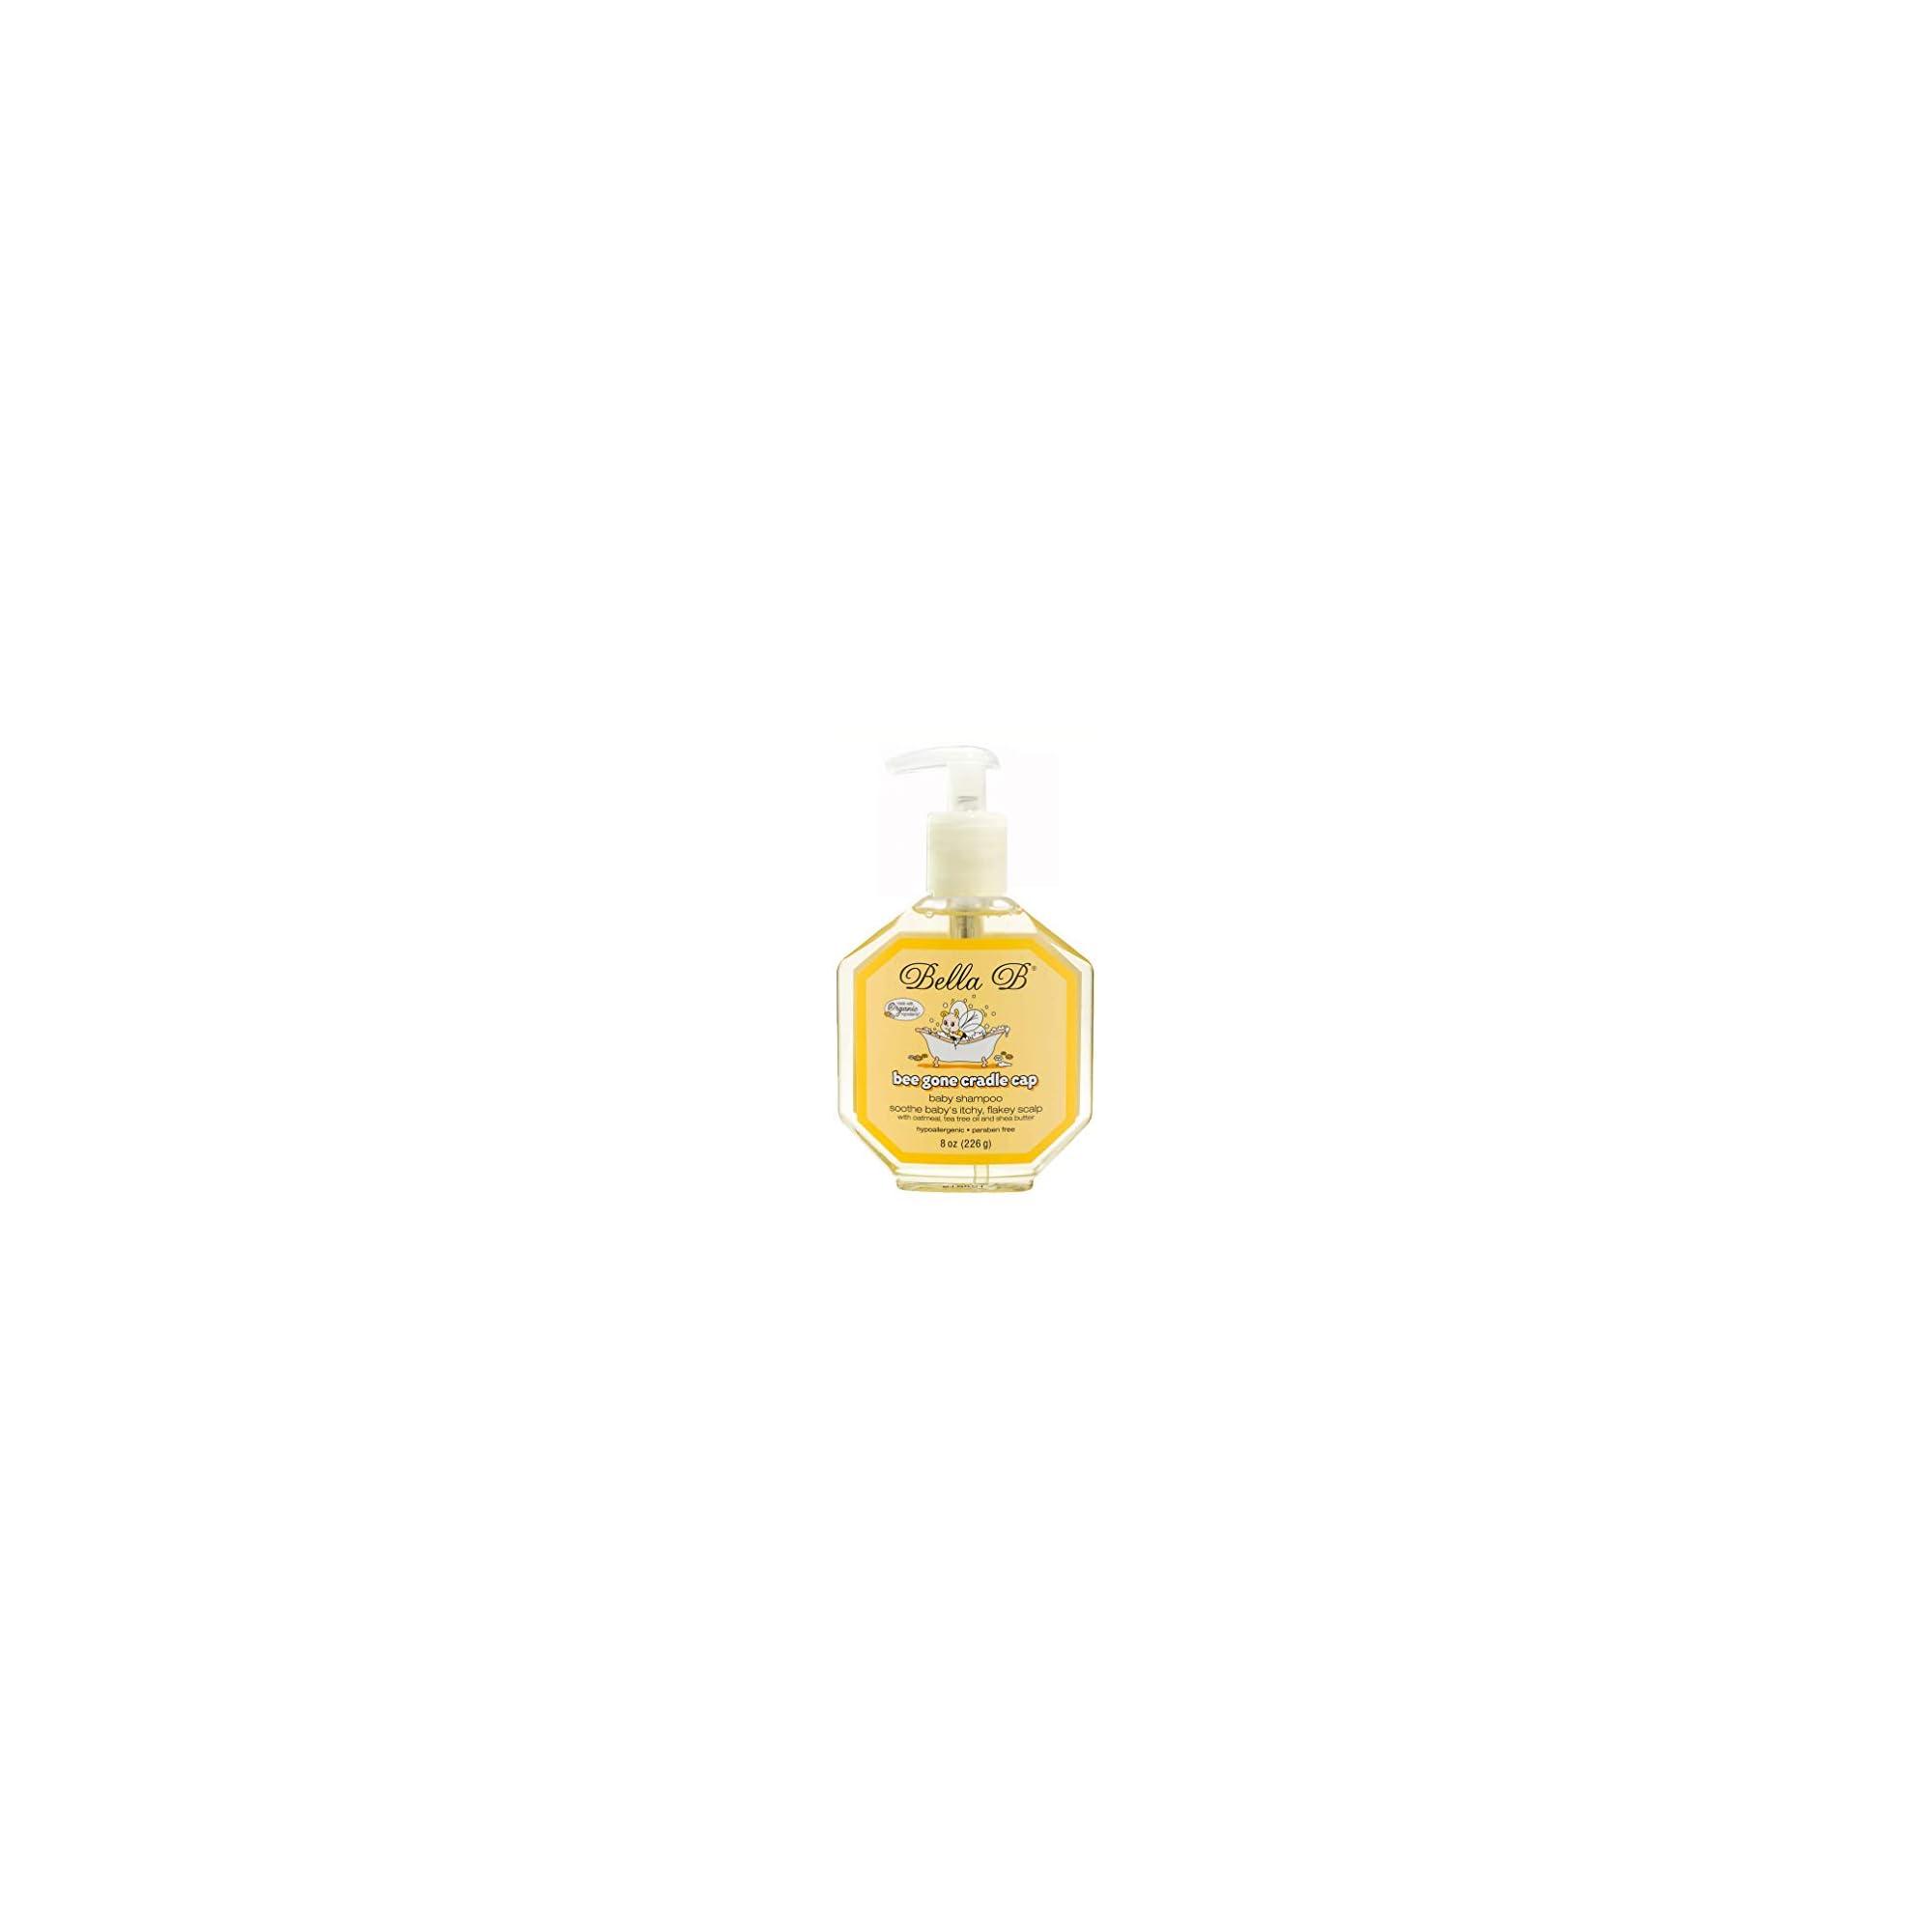 BELLA B NATURALS Bee Gone Cradle Cap Baby Shampoo 8 oz – Natural Baby Shampoo – Dry Scalp Shampoo – Cradle Cap Shampoo For Babies – Cradle Cap Treatment For Babies – Organic Baby Shampoo